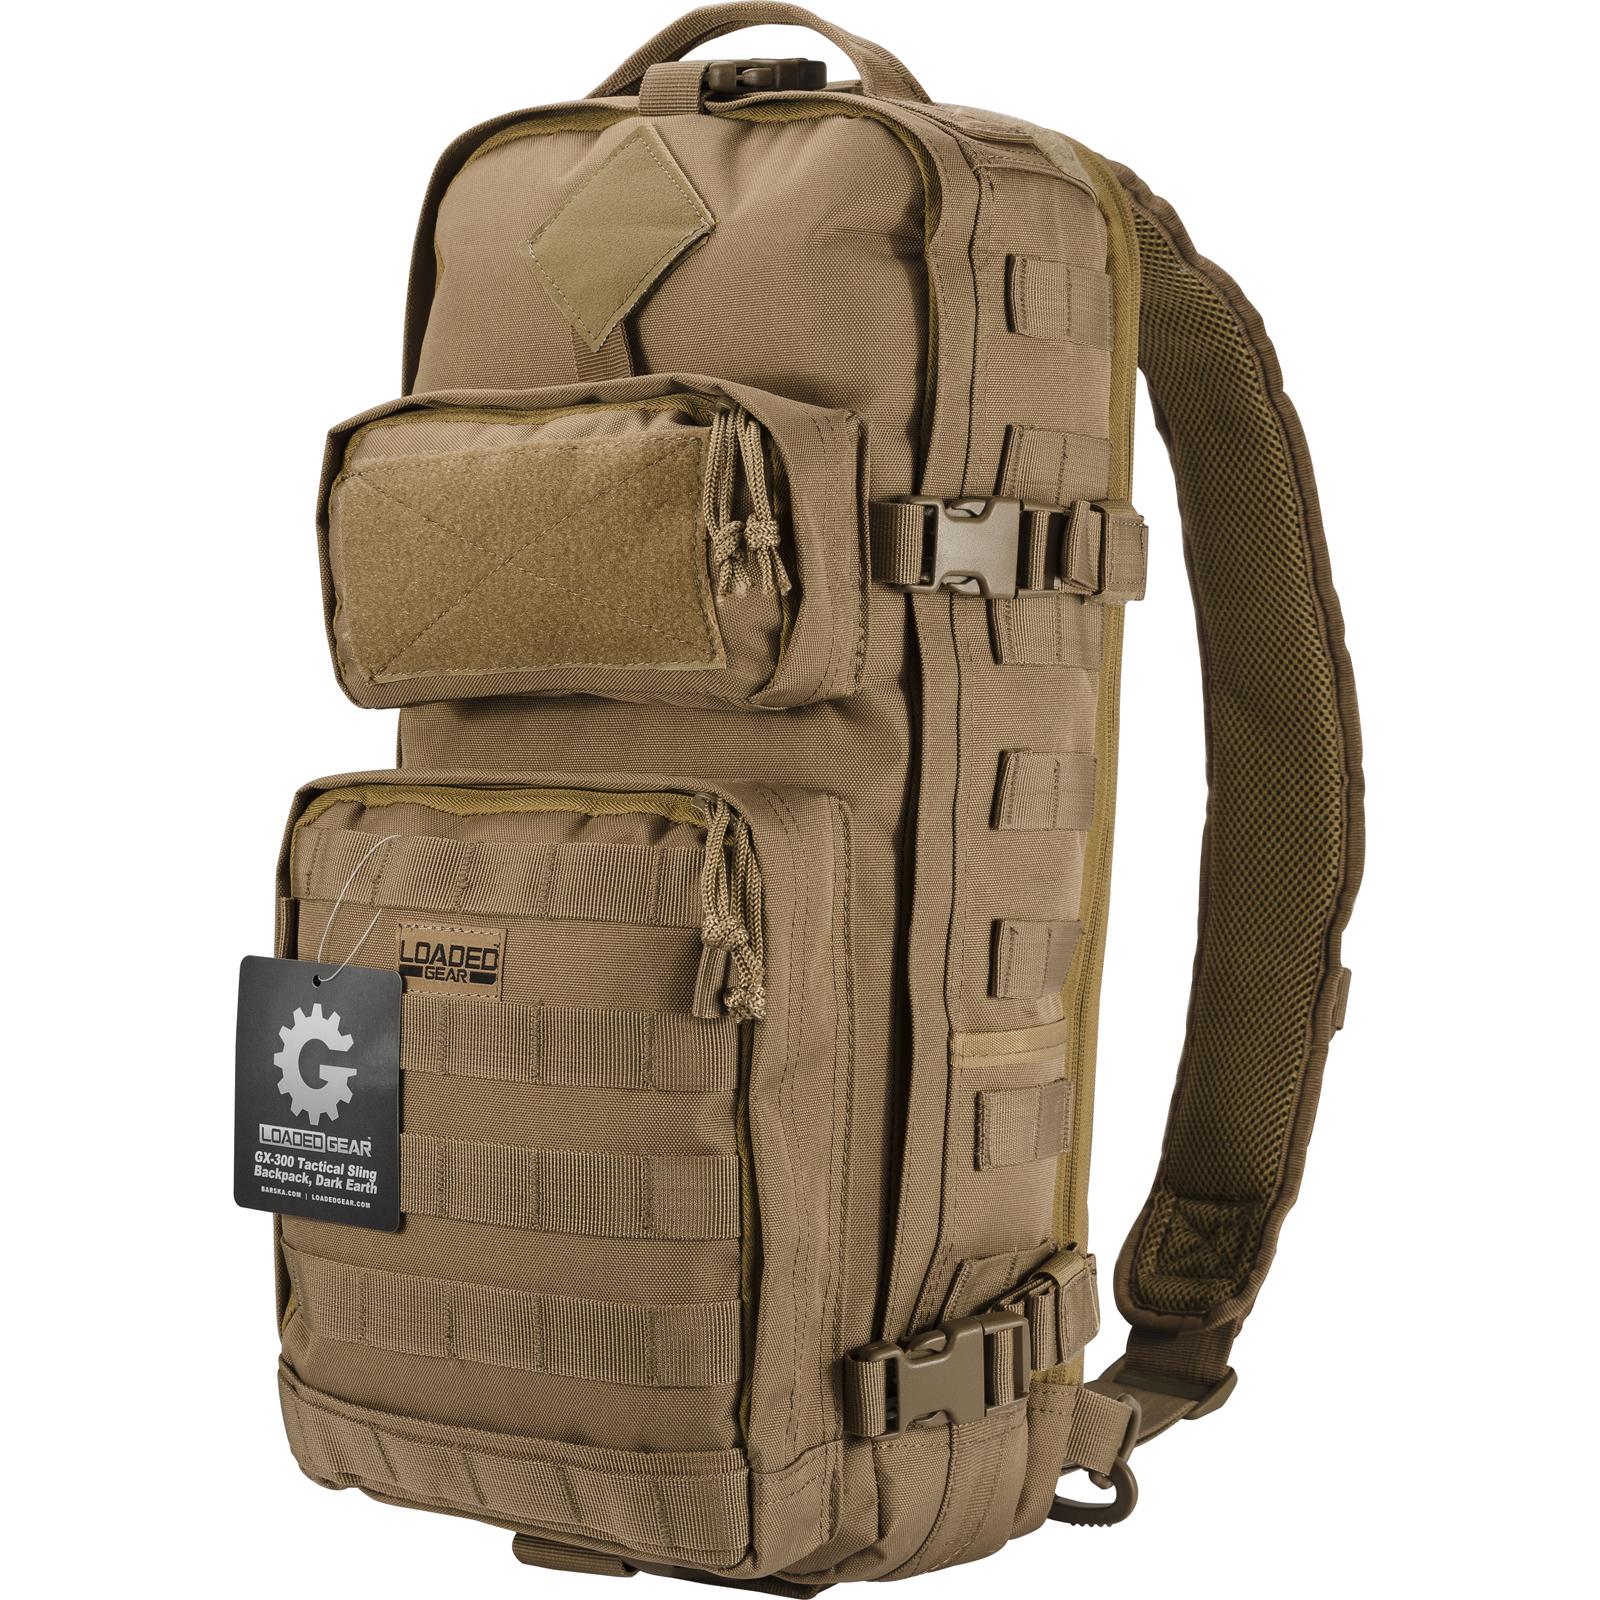 Image of Barska Loaded Gear GX-300 Tactical Sling Backpack (Flat Dark Earth)